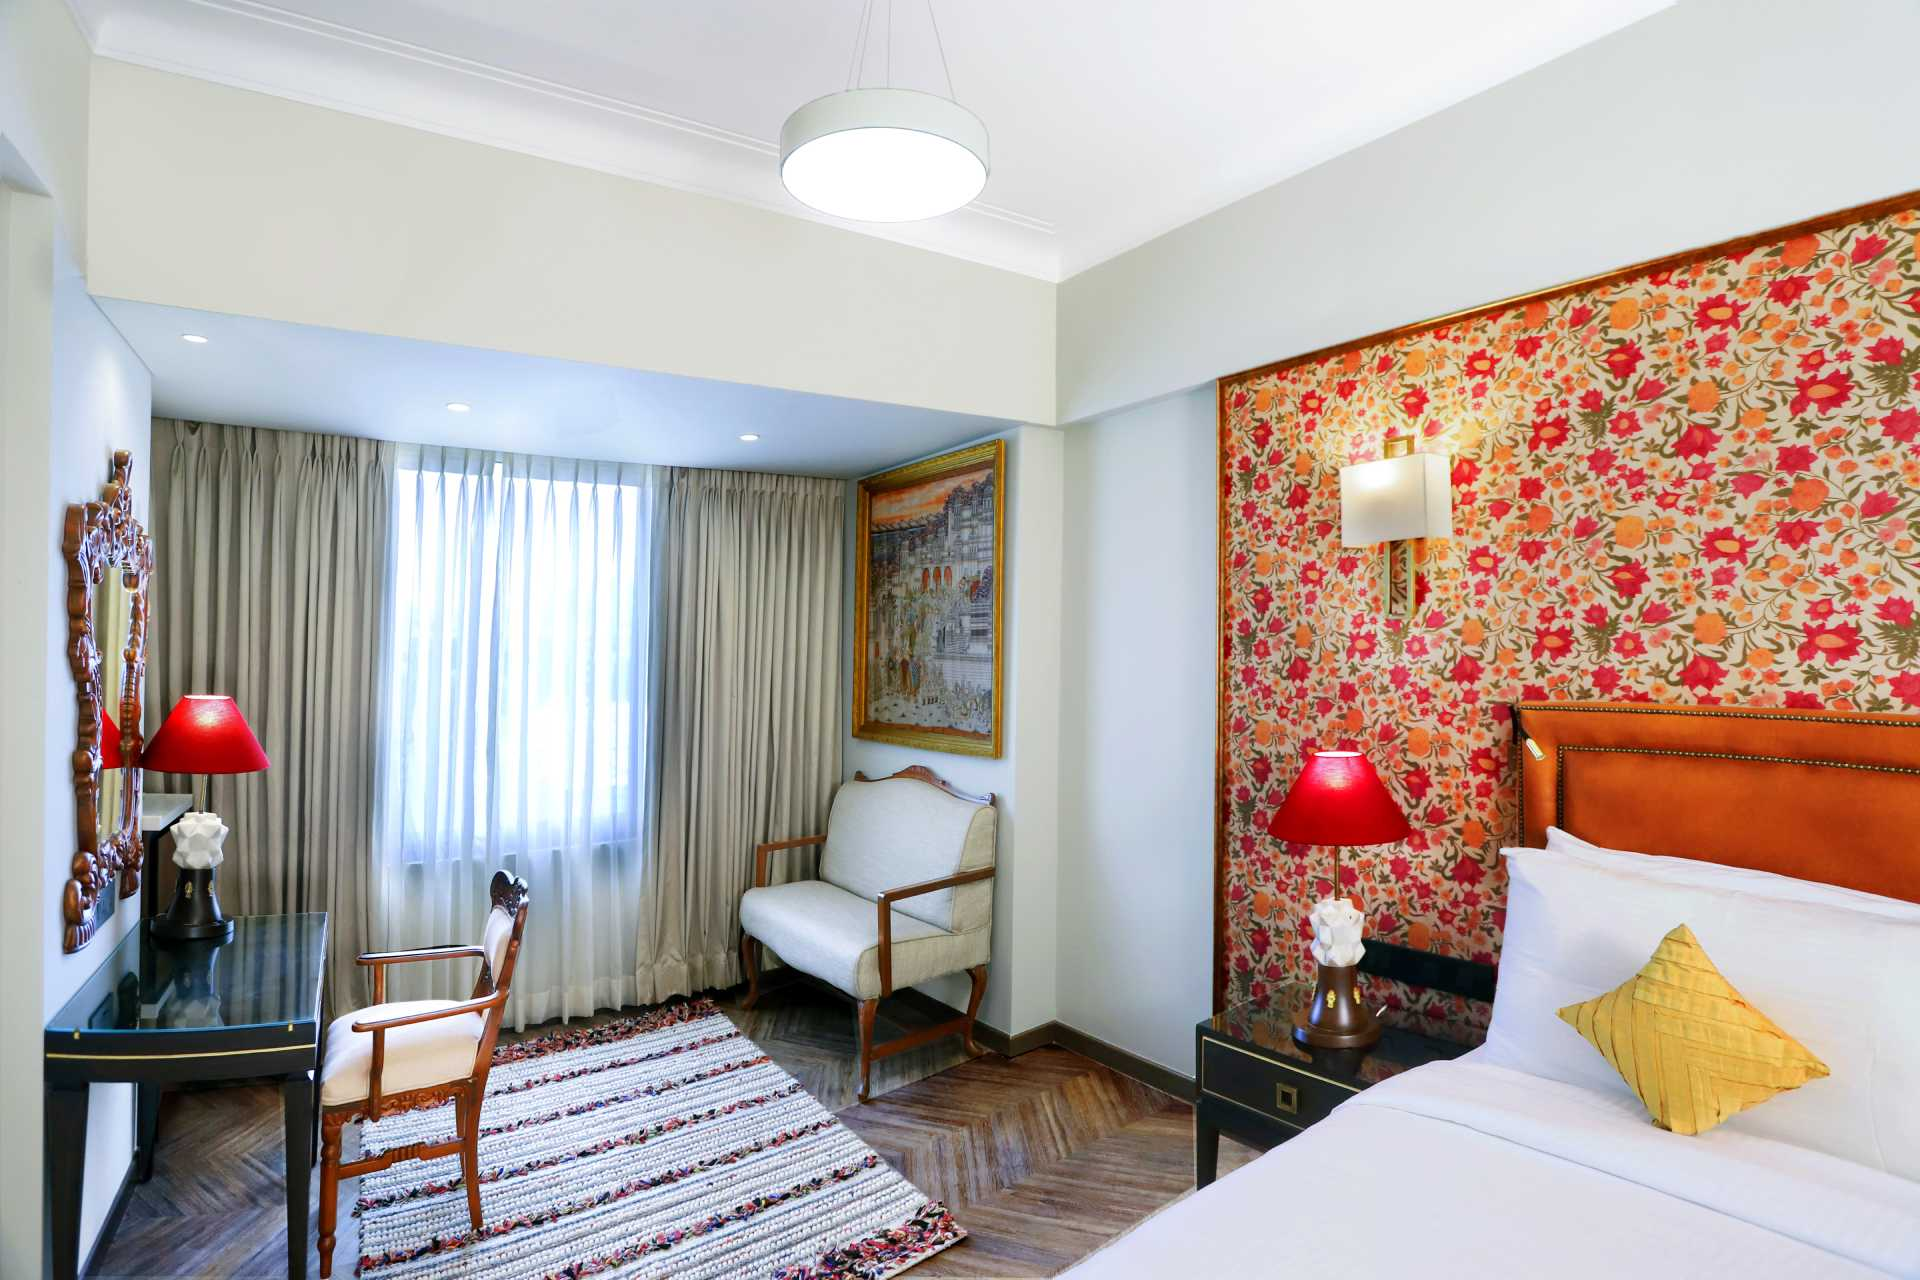 premium room 502 ambassaodor hotel 4 - The Ambassador | Heritage Hotels in Mumbai, Aurangabad, Chennai - Ambassador Hotels